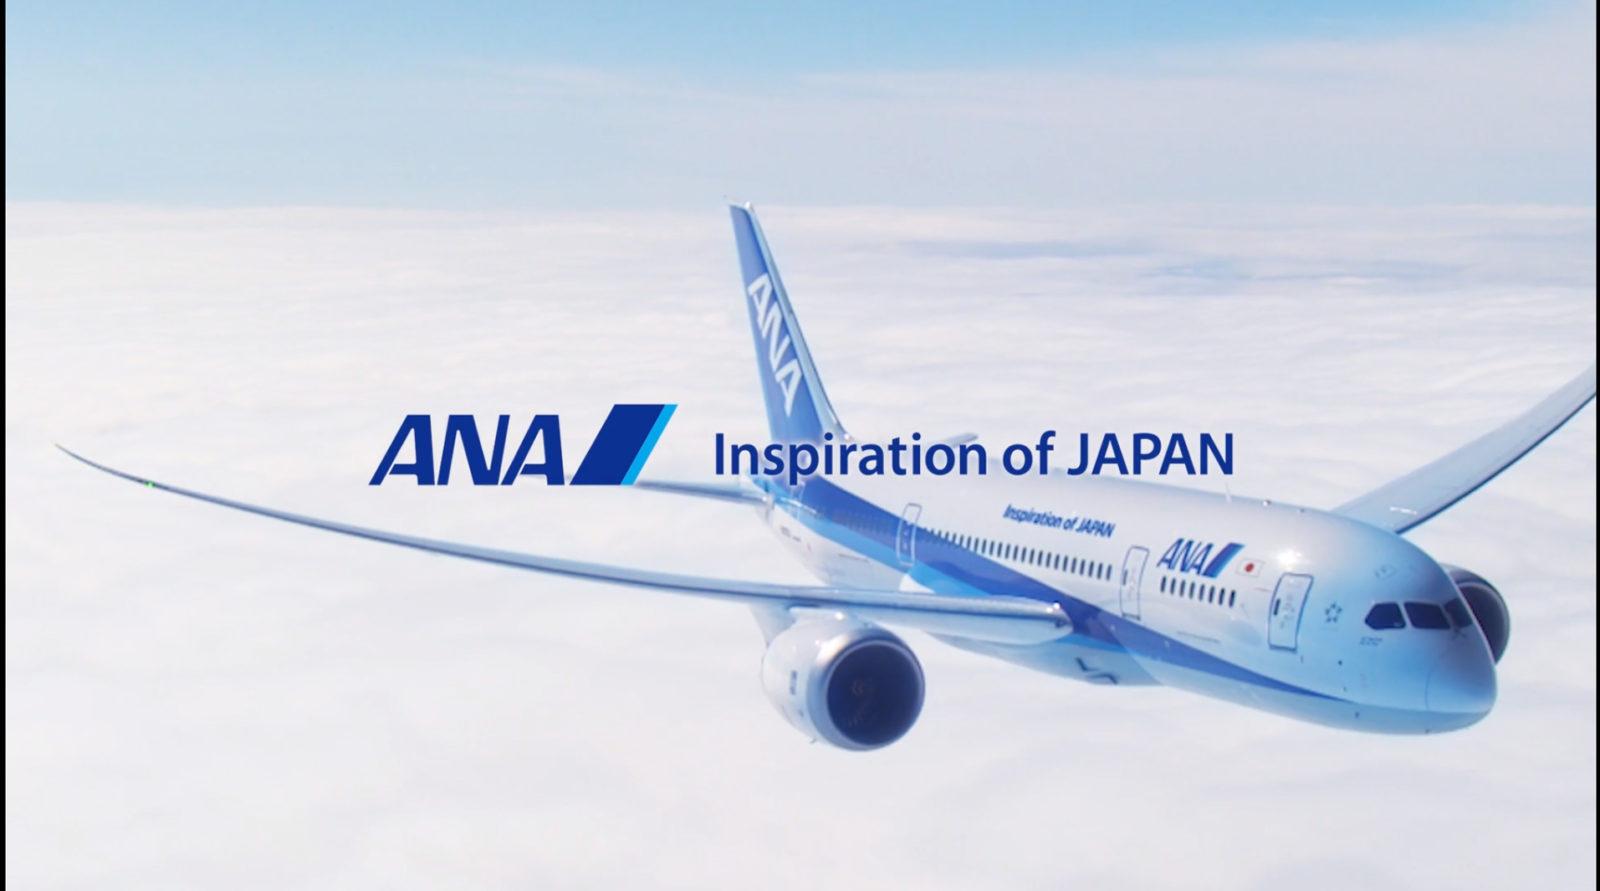 ANA / アジア向けプロモーション映像